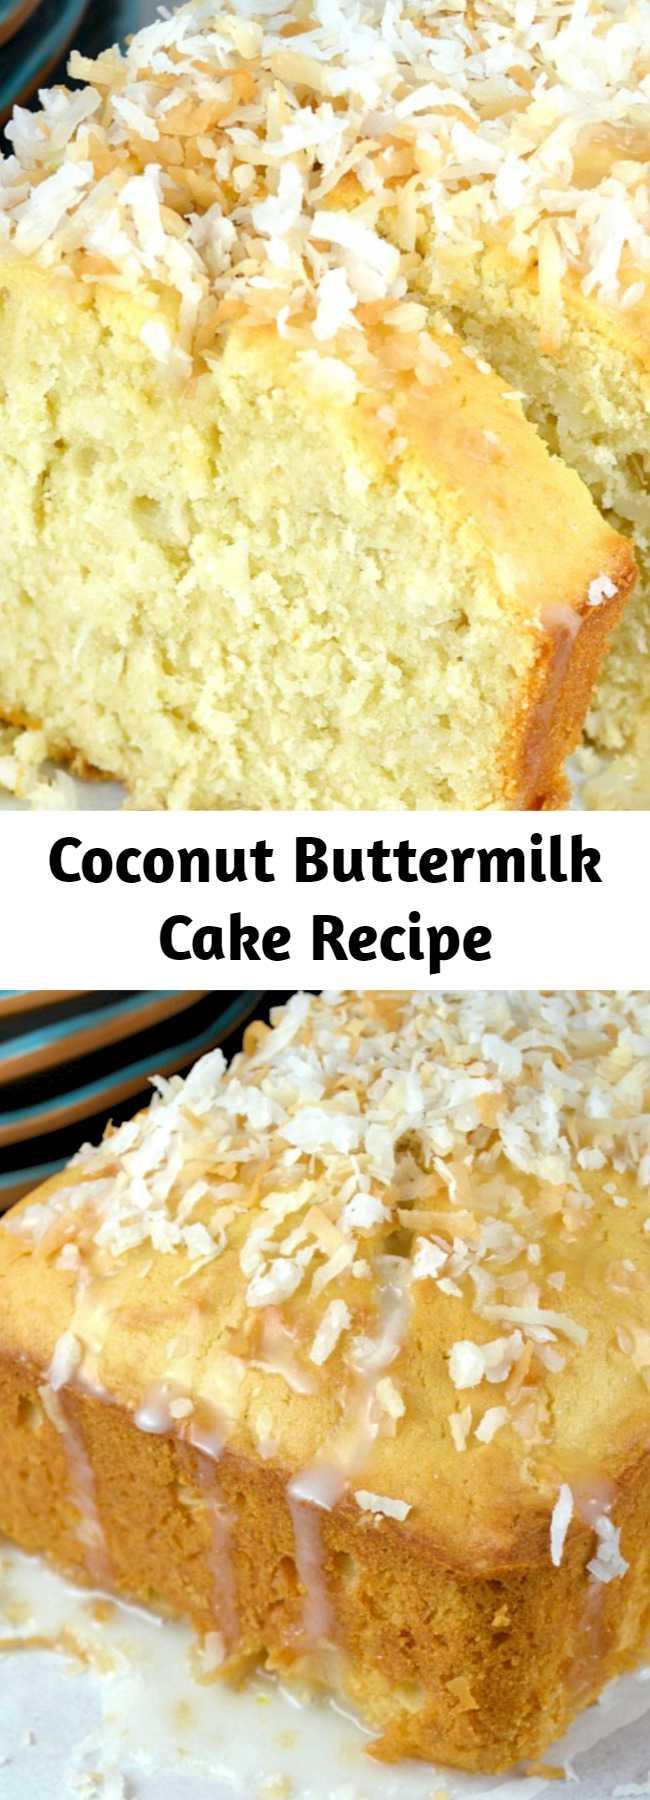 Coconut Buttermilk Cake Recipe